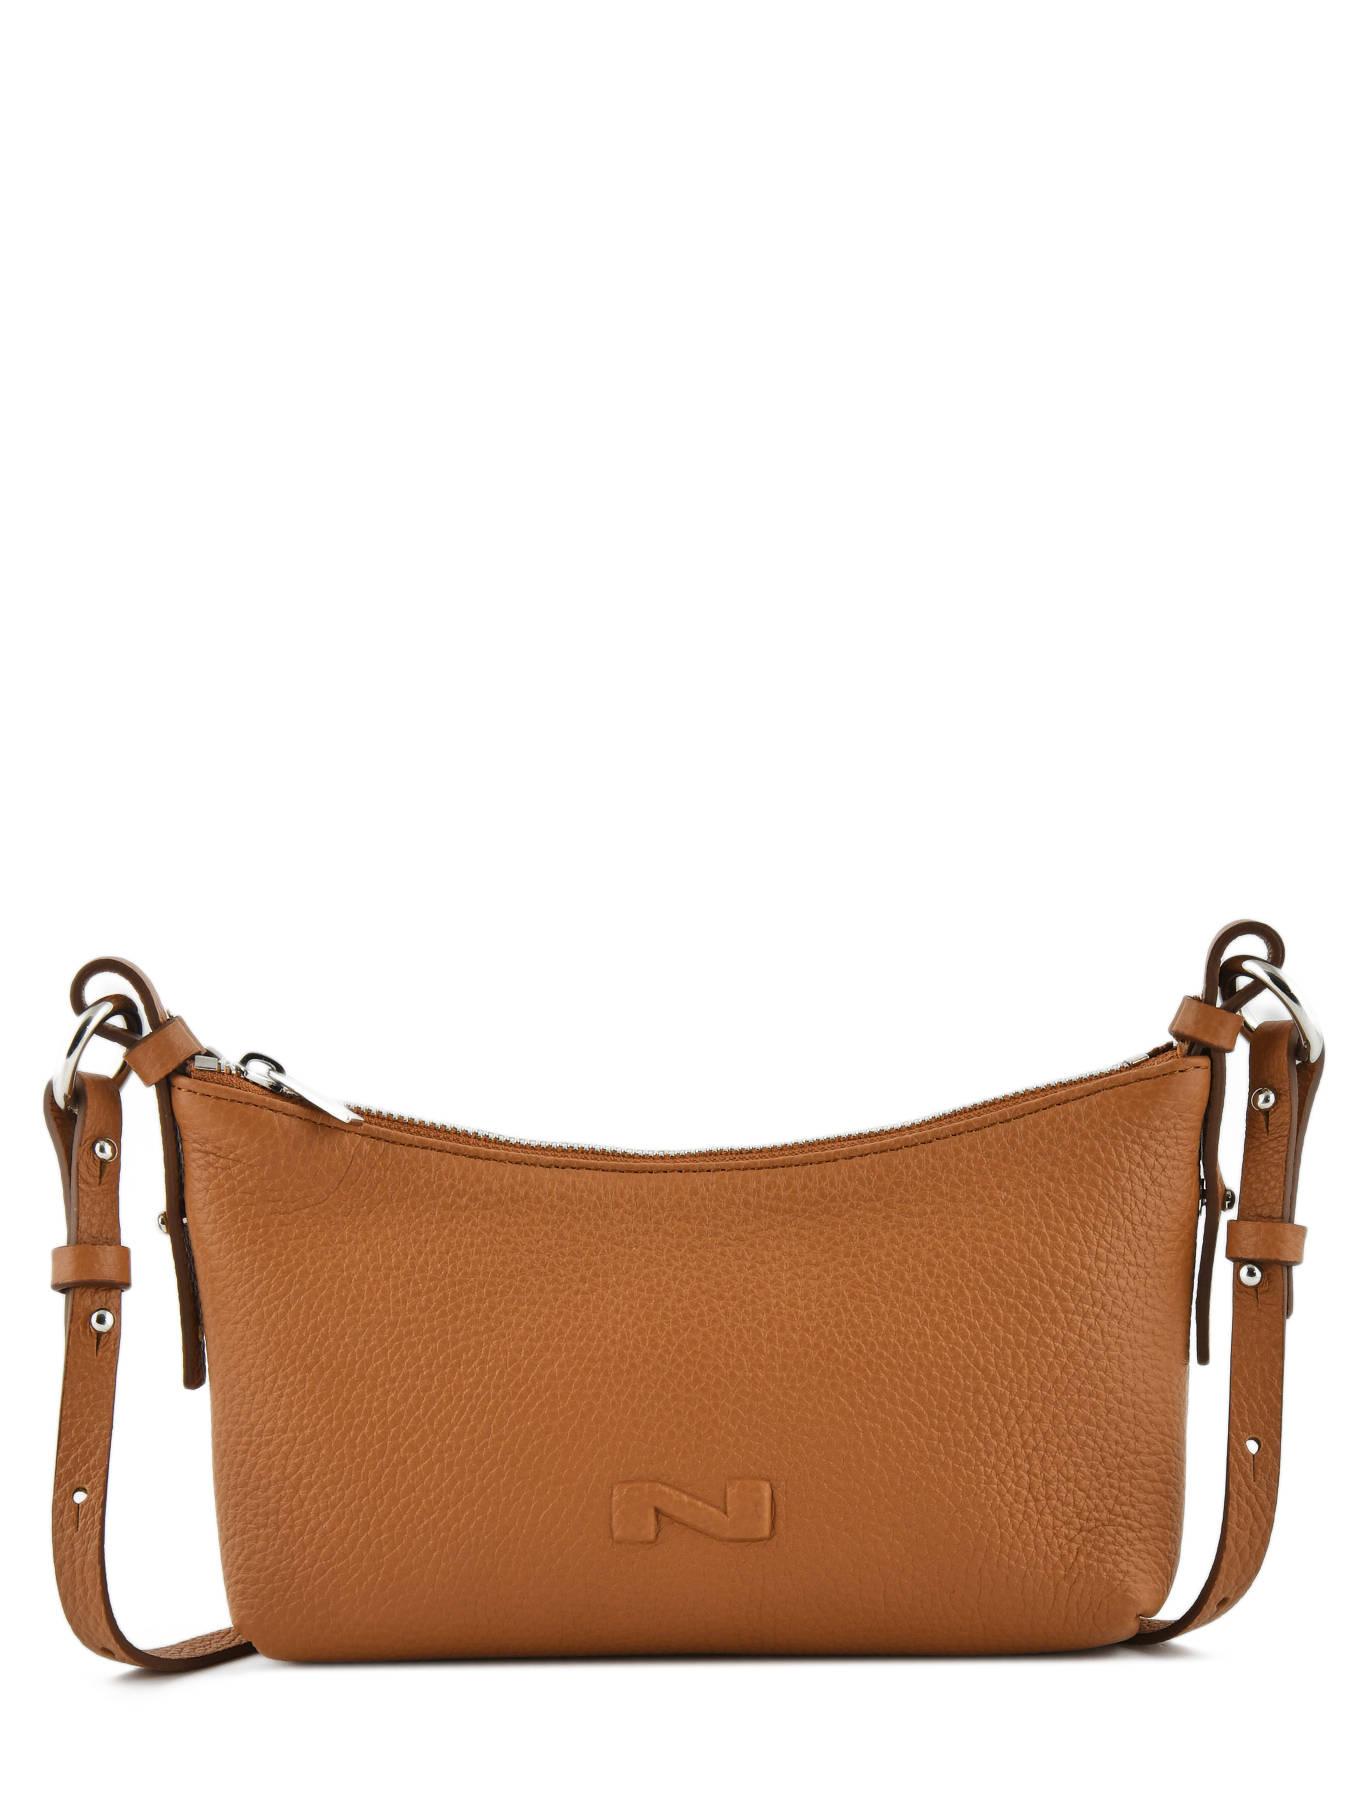 ffbc1349337a ... Shoulder Bag Ideal Leather Nathan baume Brown n city N1721048 ...